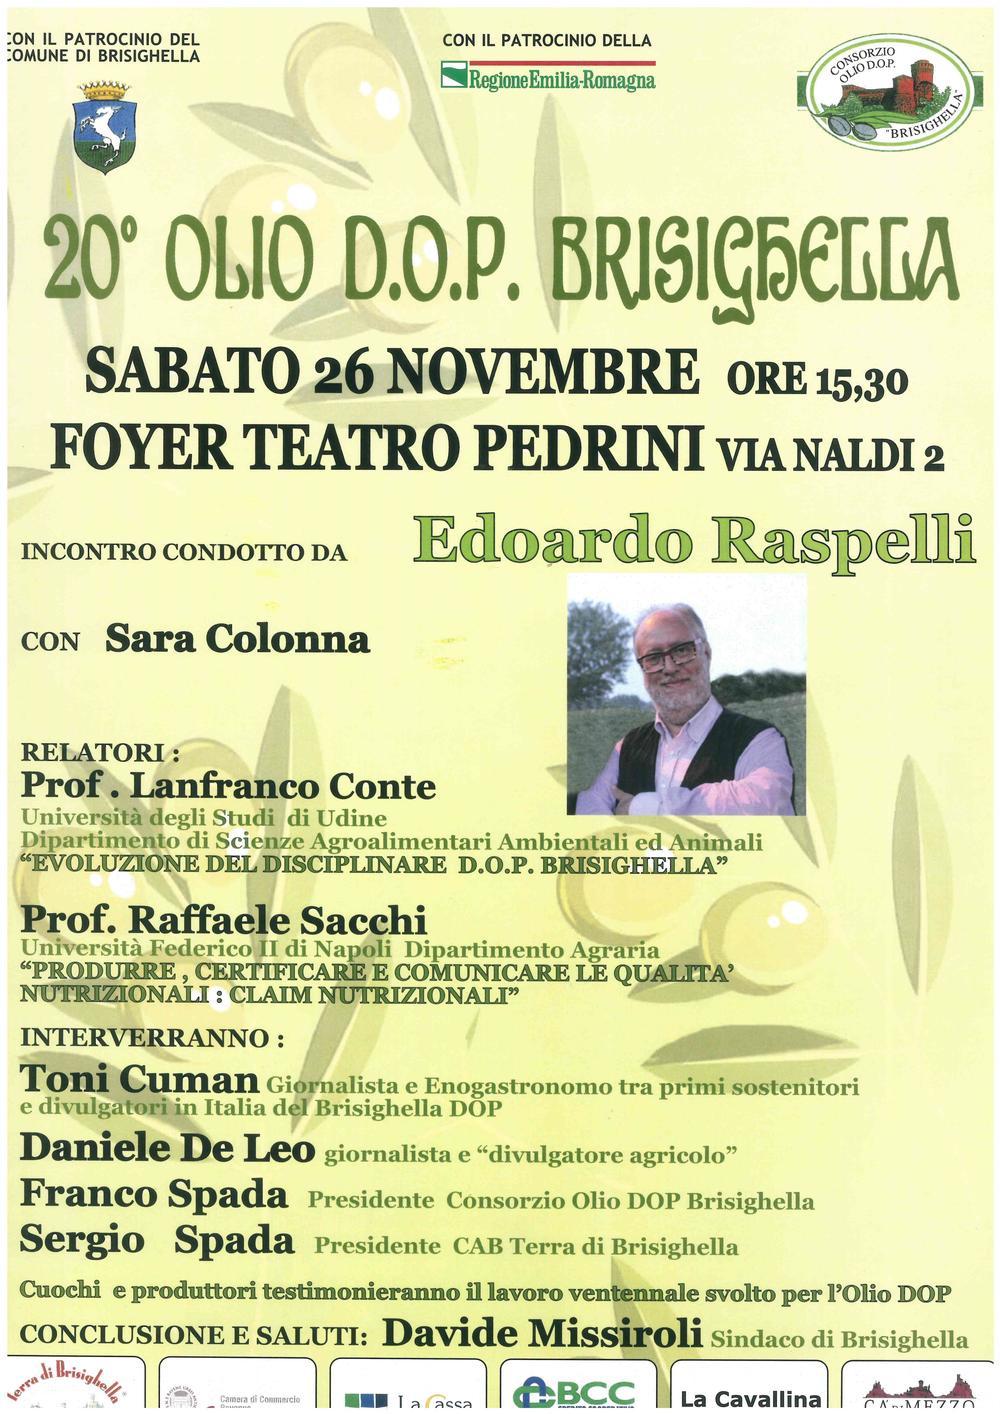 20° Olio D.O.P Brisighella